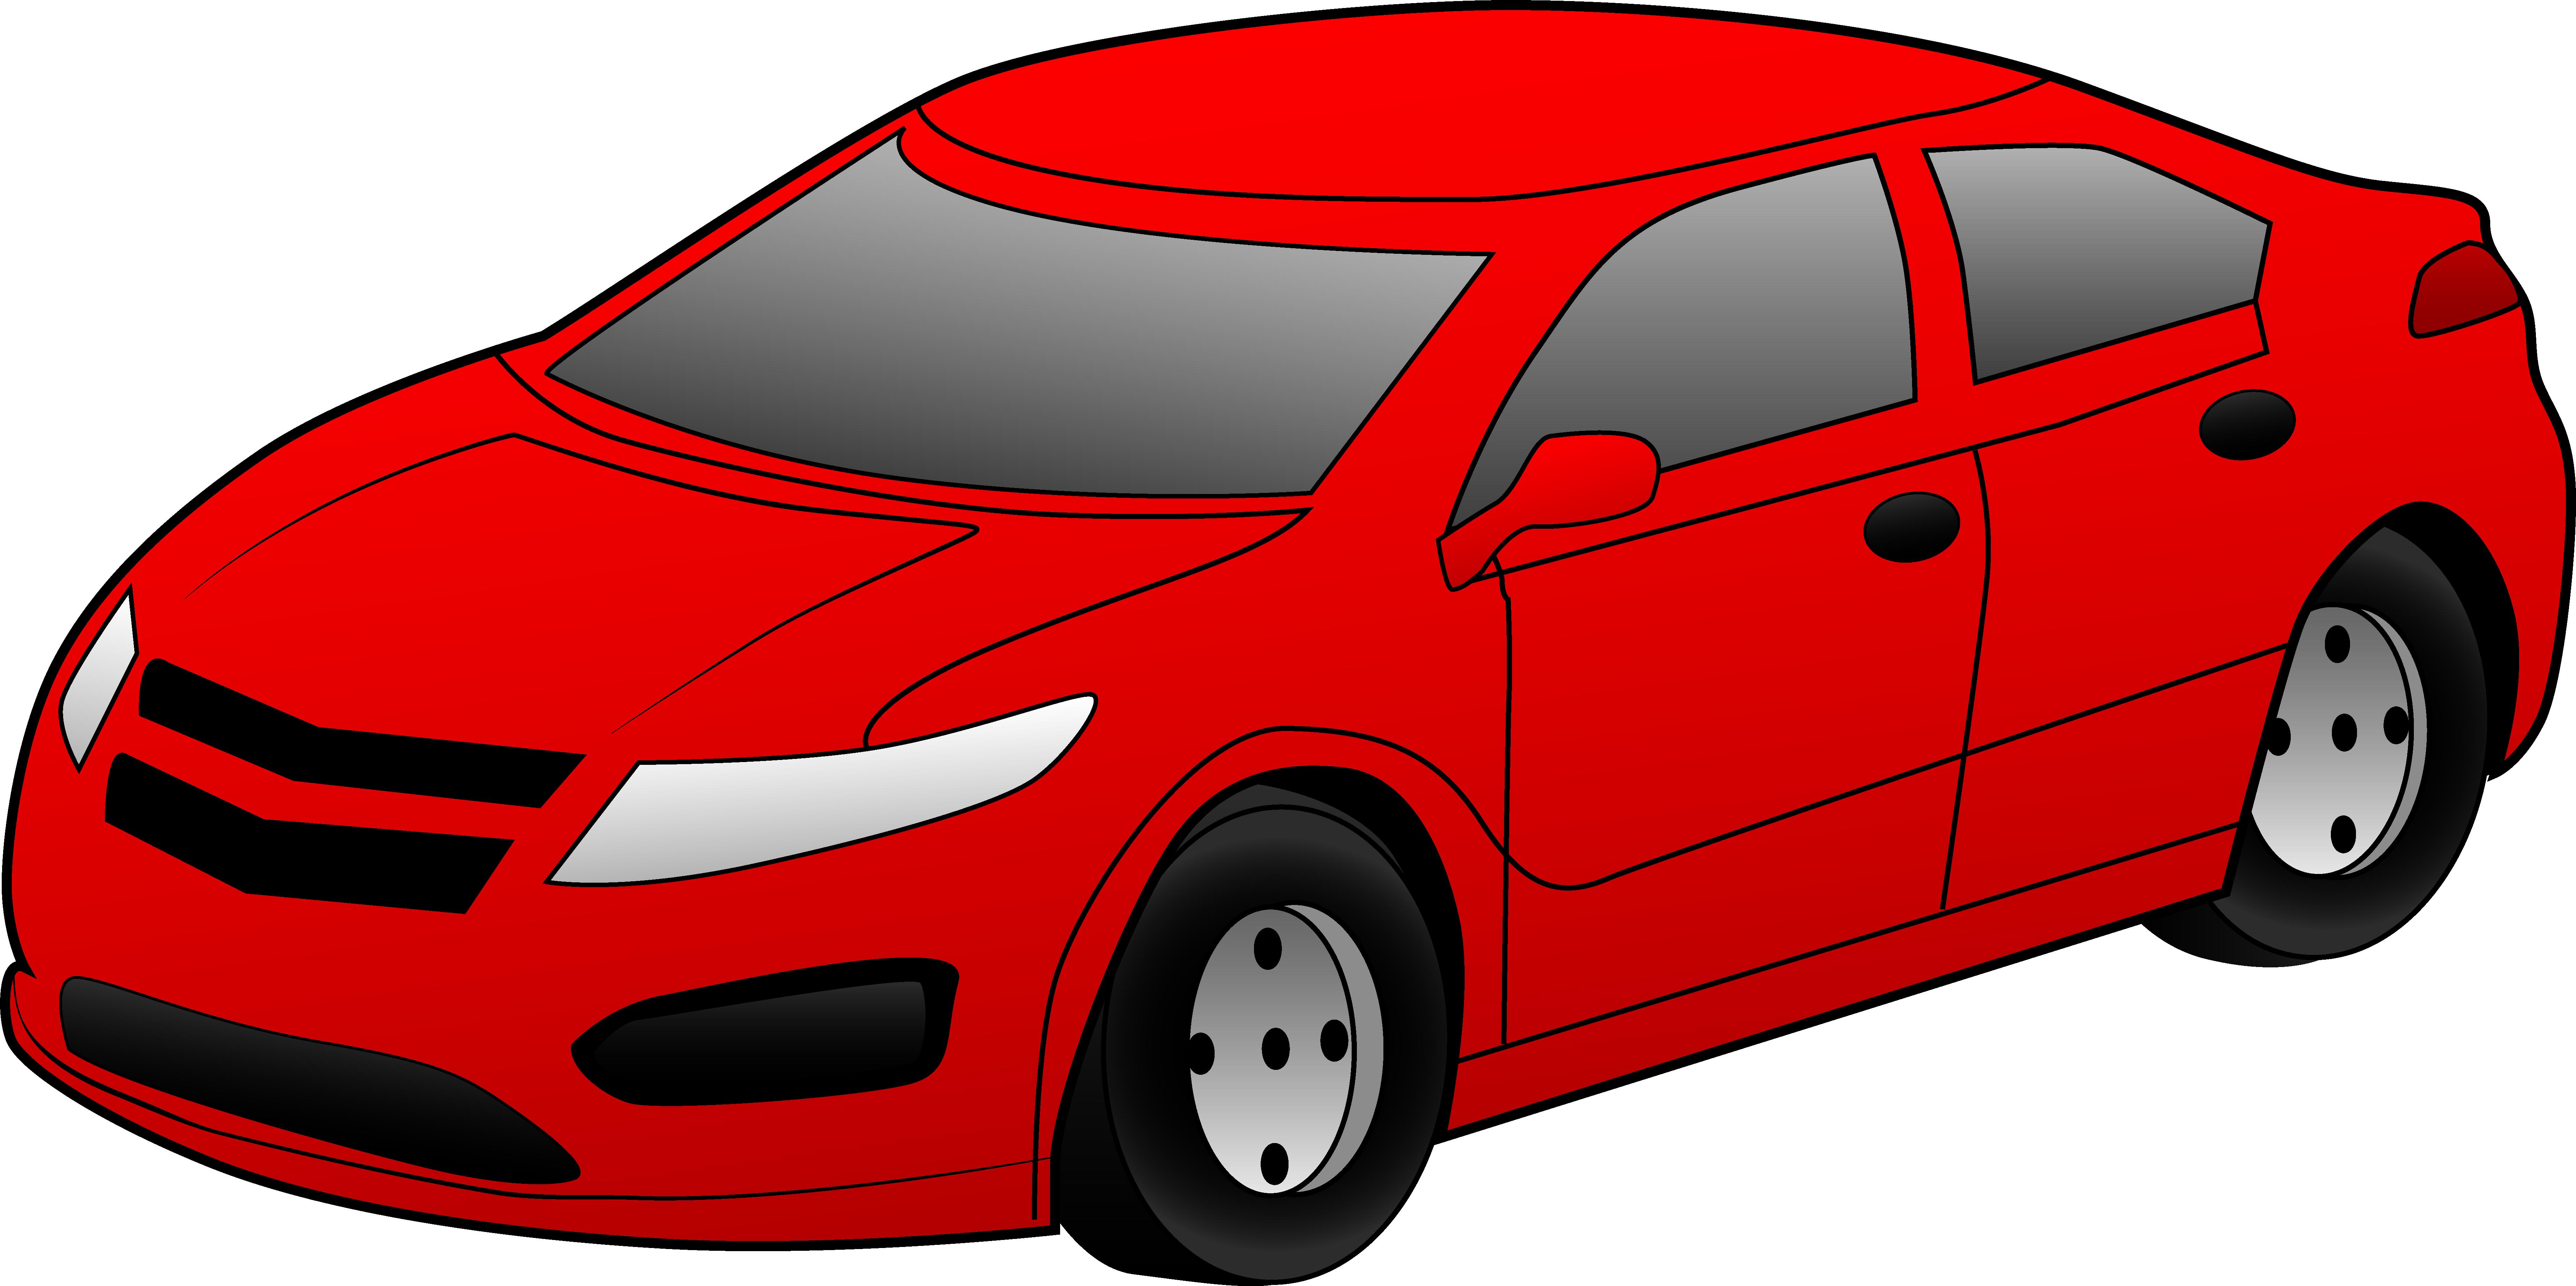 Race Car Image Clip Art